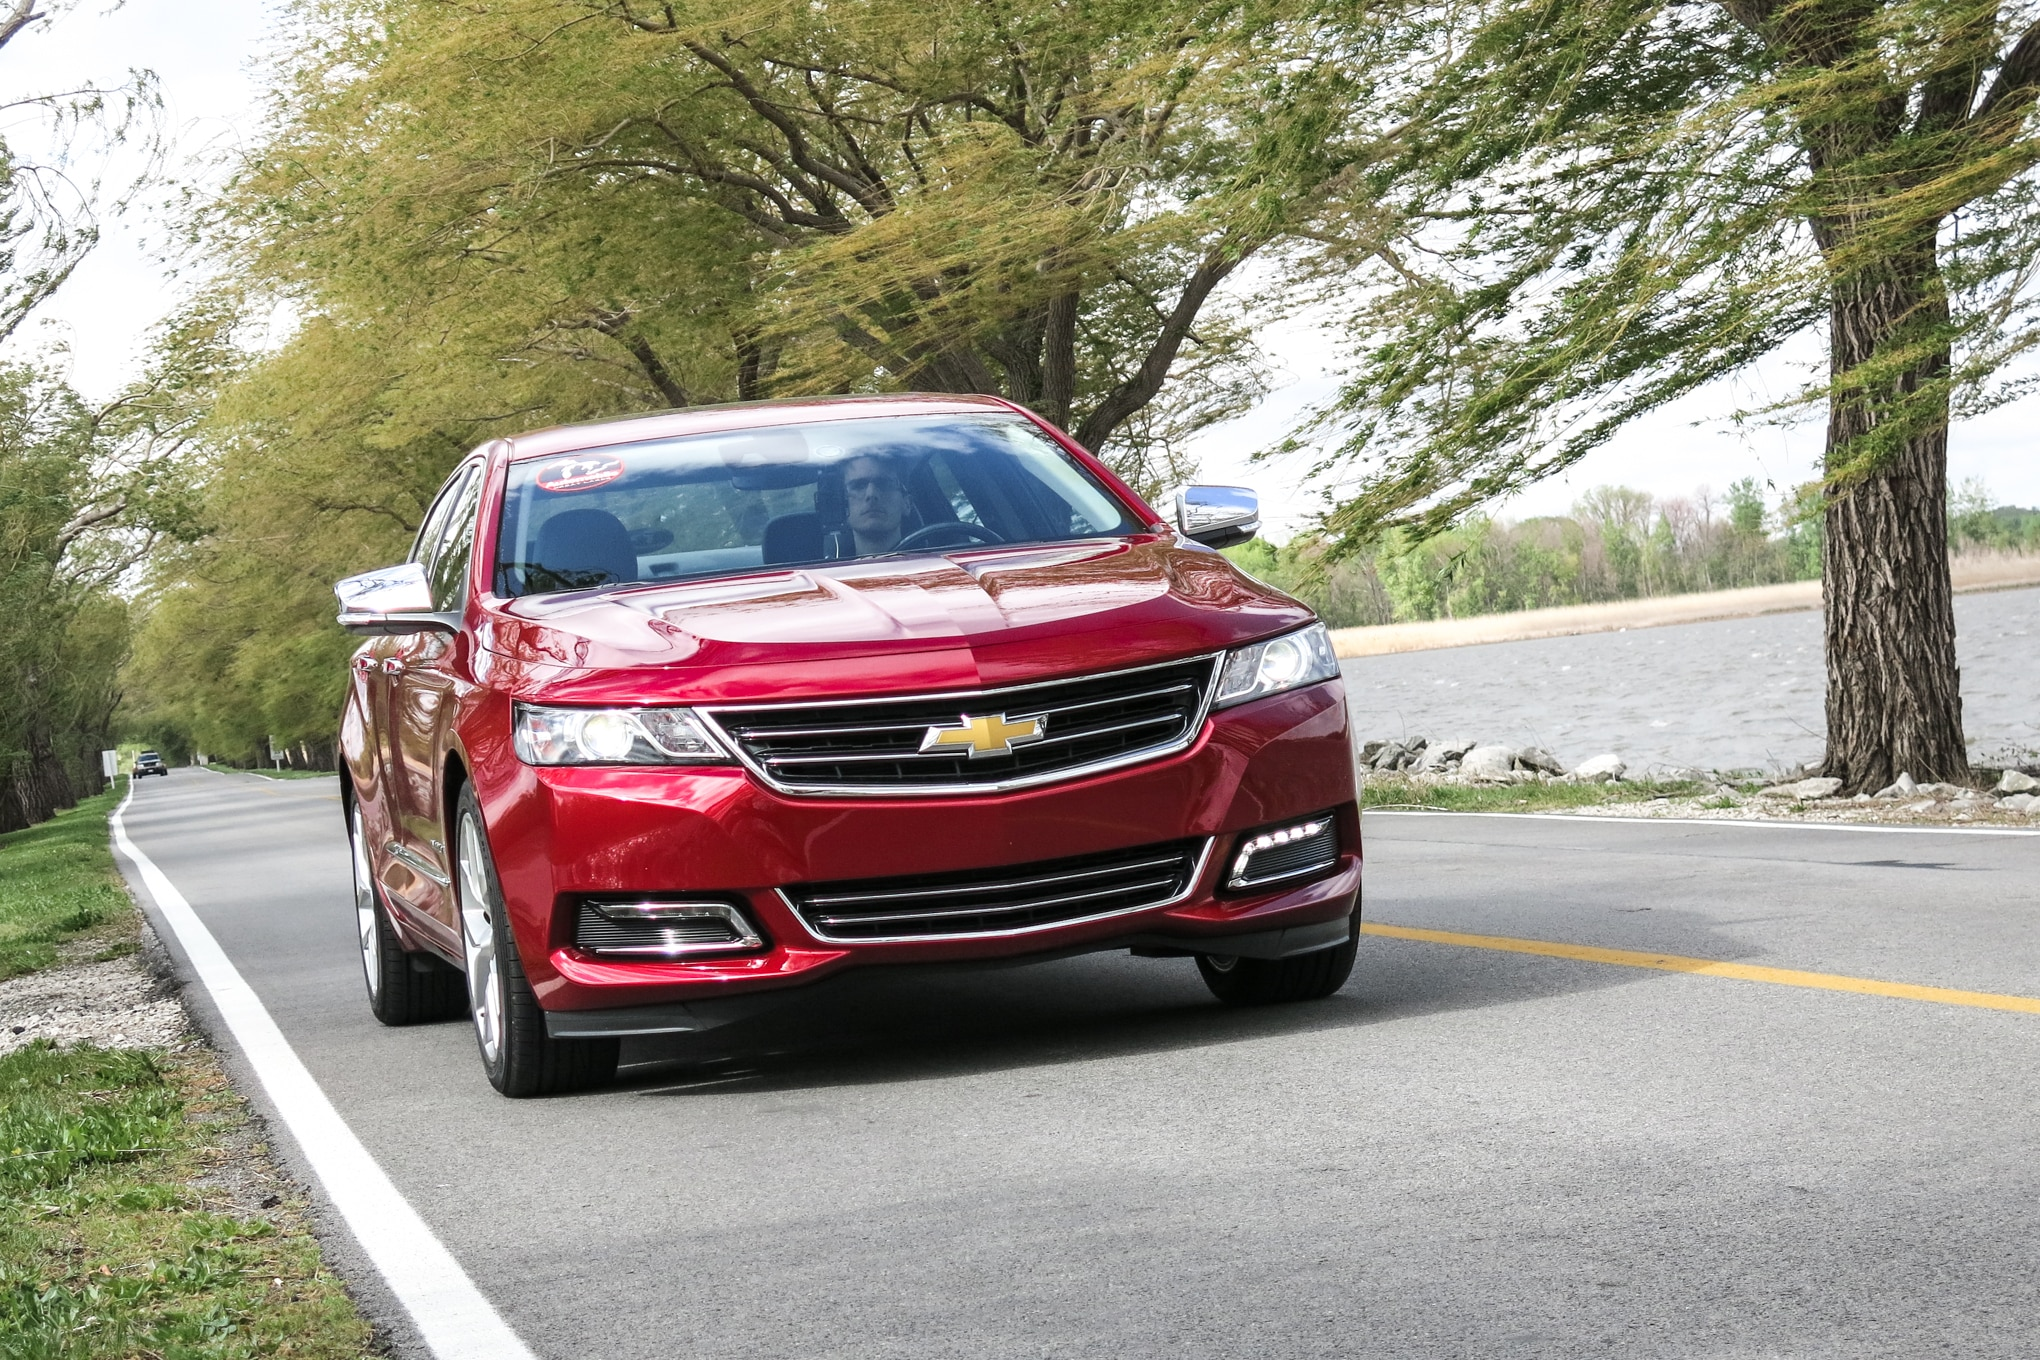 2014 Chevrolet Impala 2.5 1LT First Drive - Automobile ...